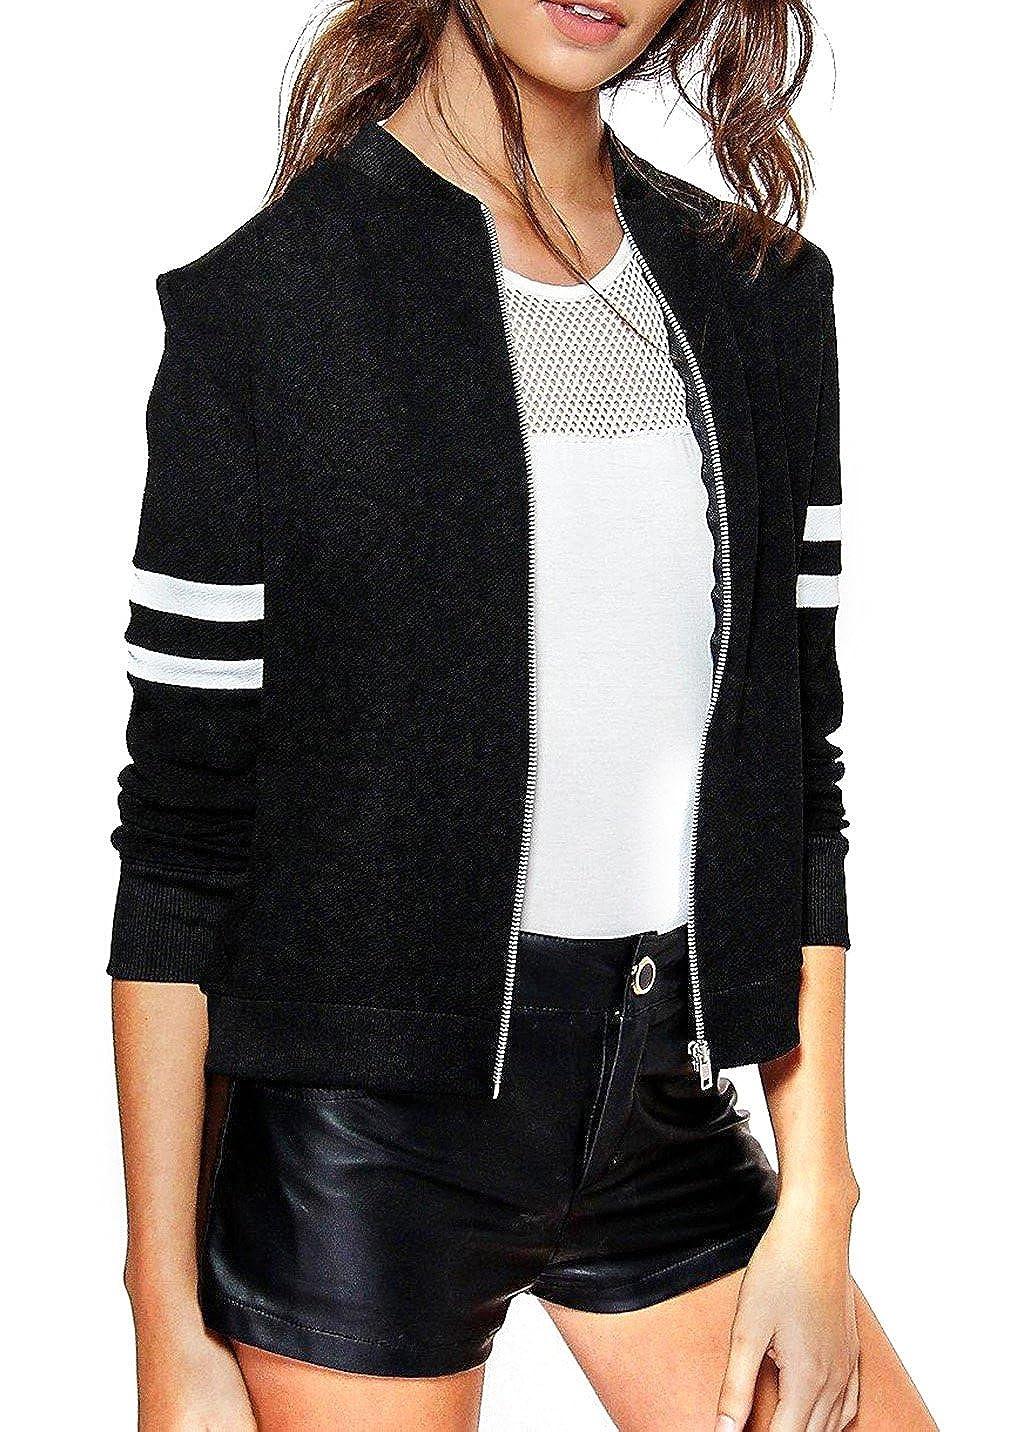 Xiang Ru Sport Stil-Damen Mädchen Sweatjacket College Outwear Jacke, Langärmelig Langärmelig XRU161220A365